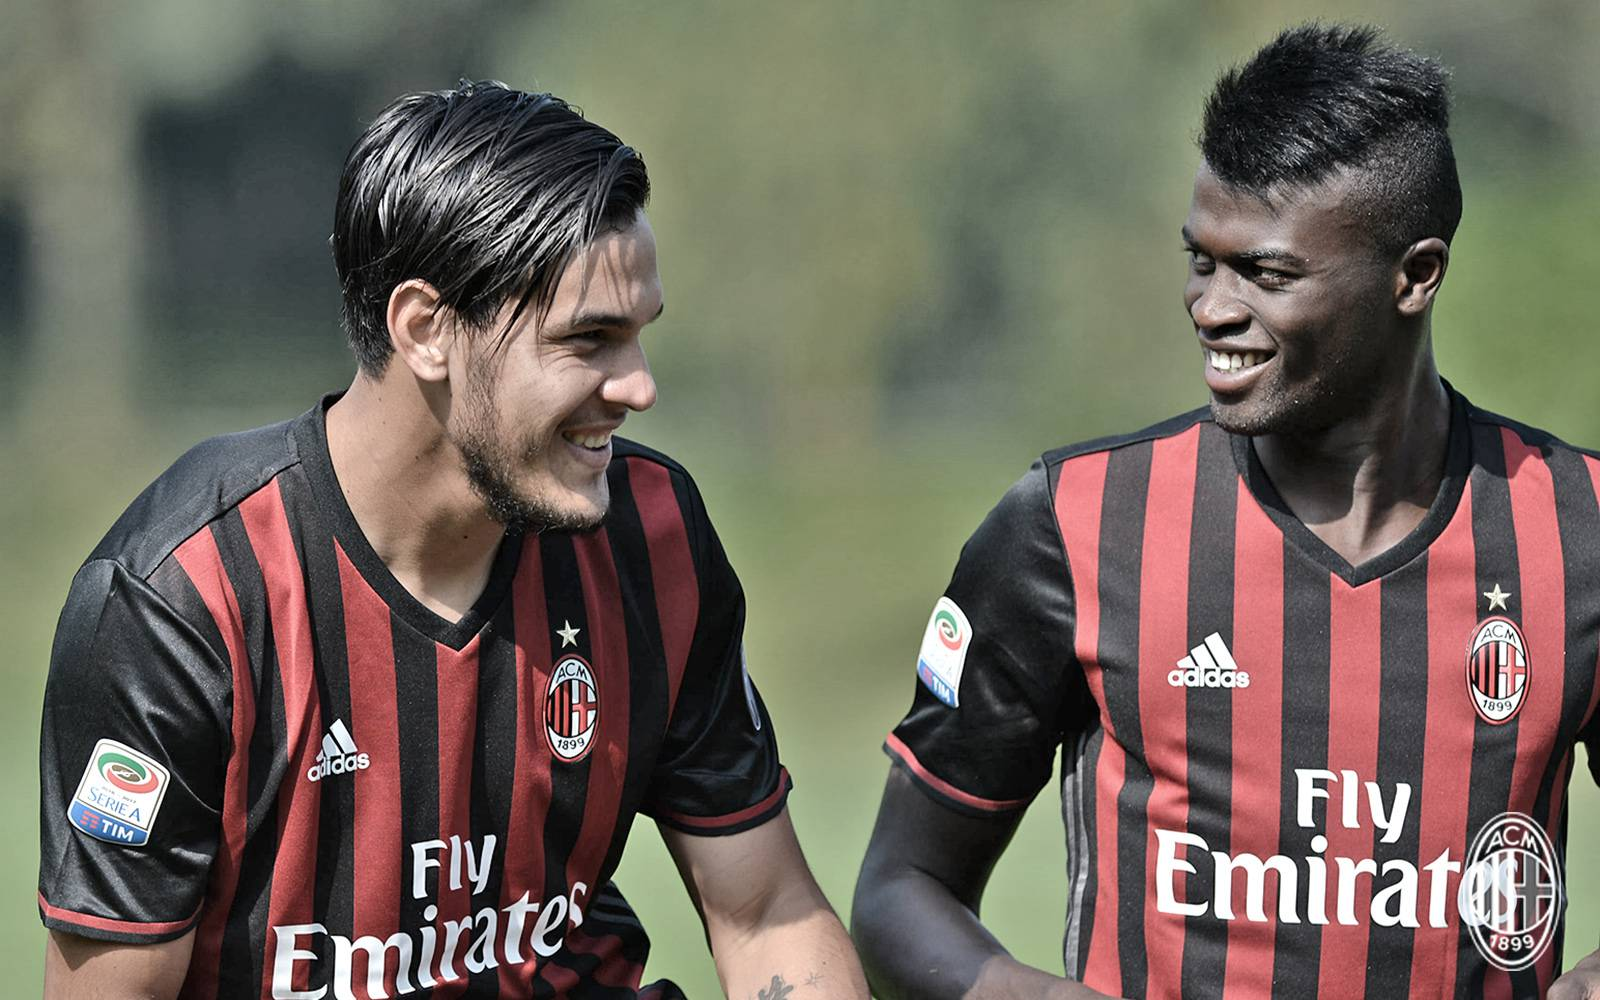 Gustavo Gomez e M'Baye Niang, insieme al Milan nella stagione 2016/2017